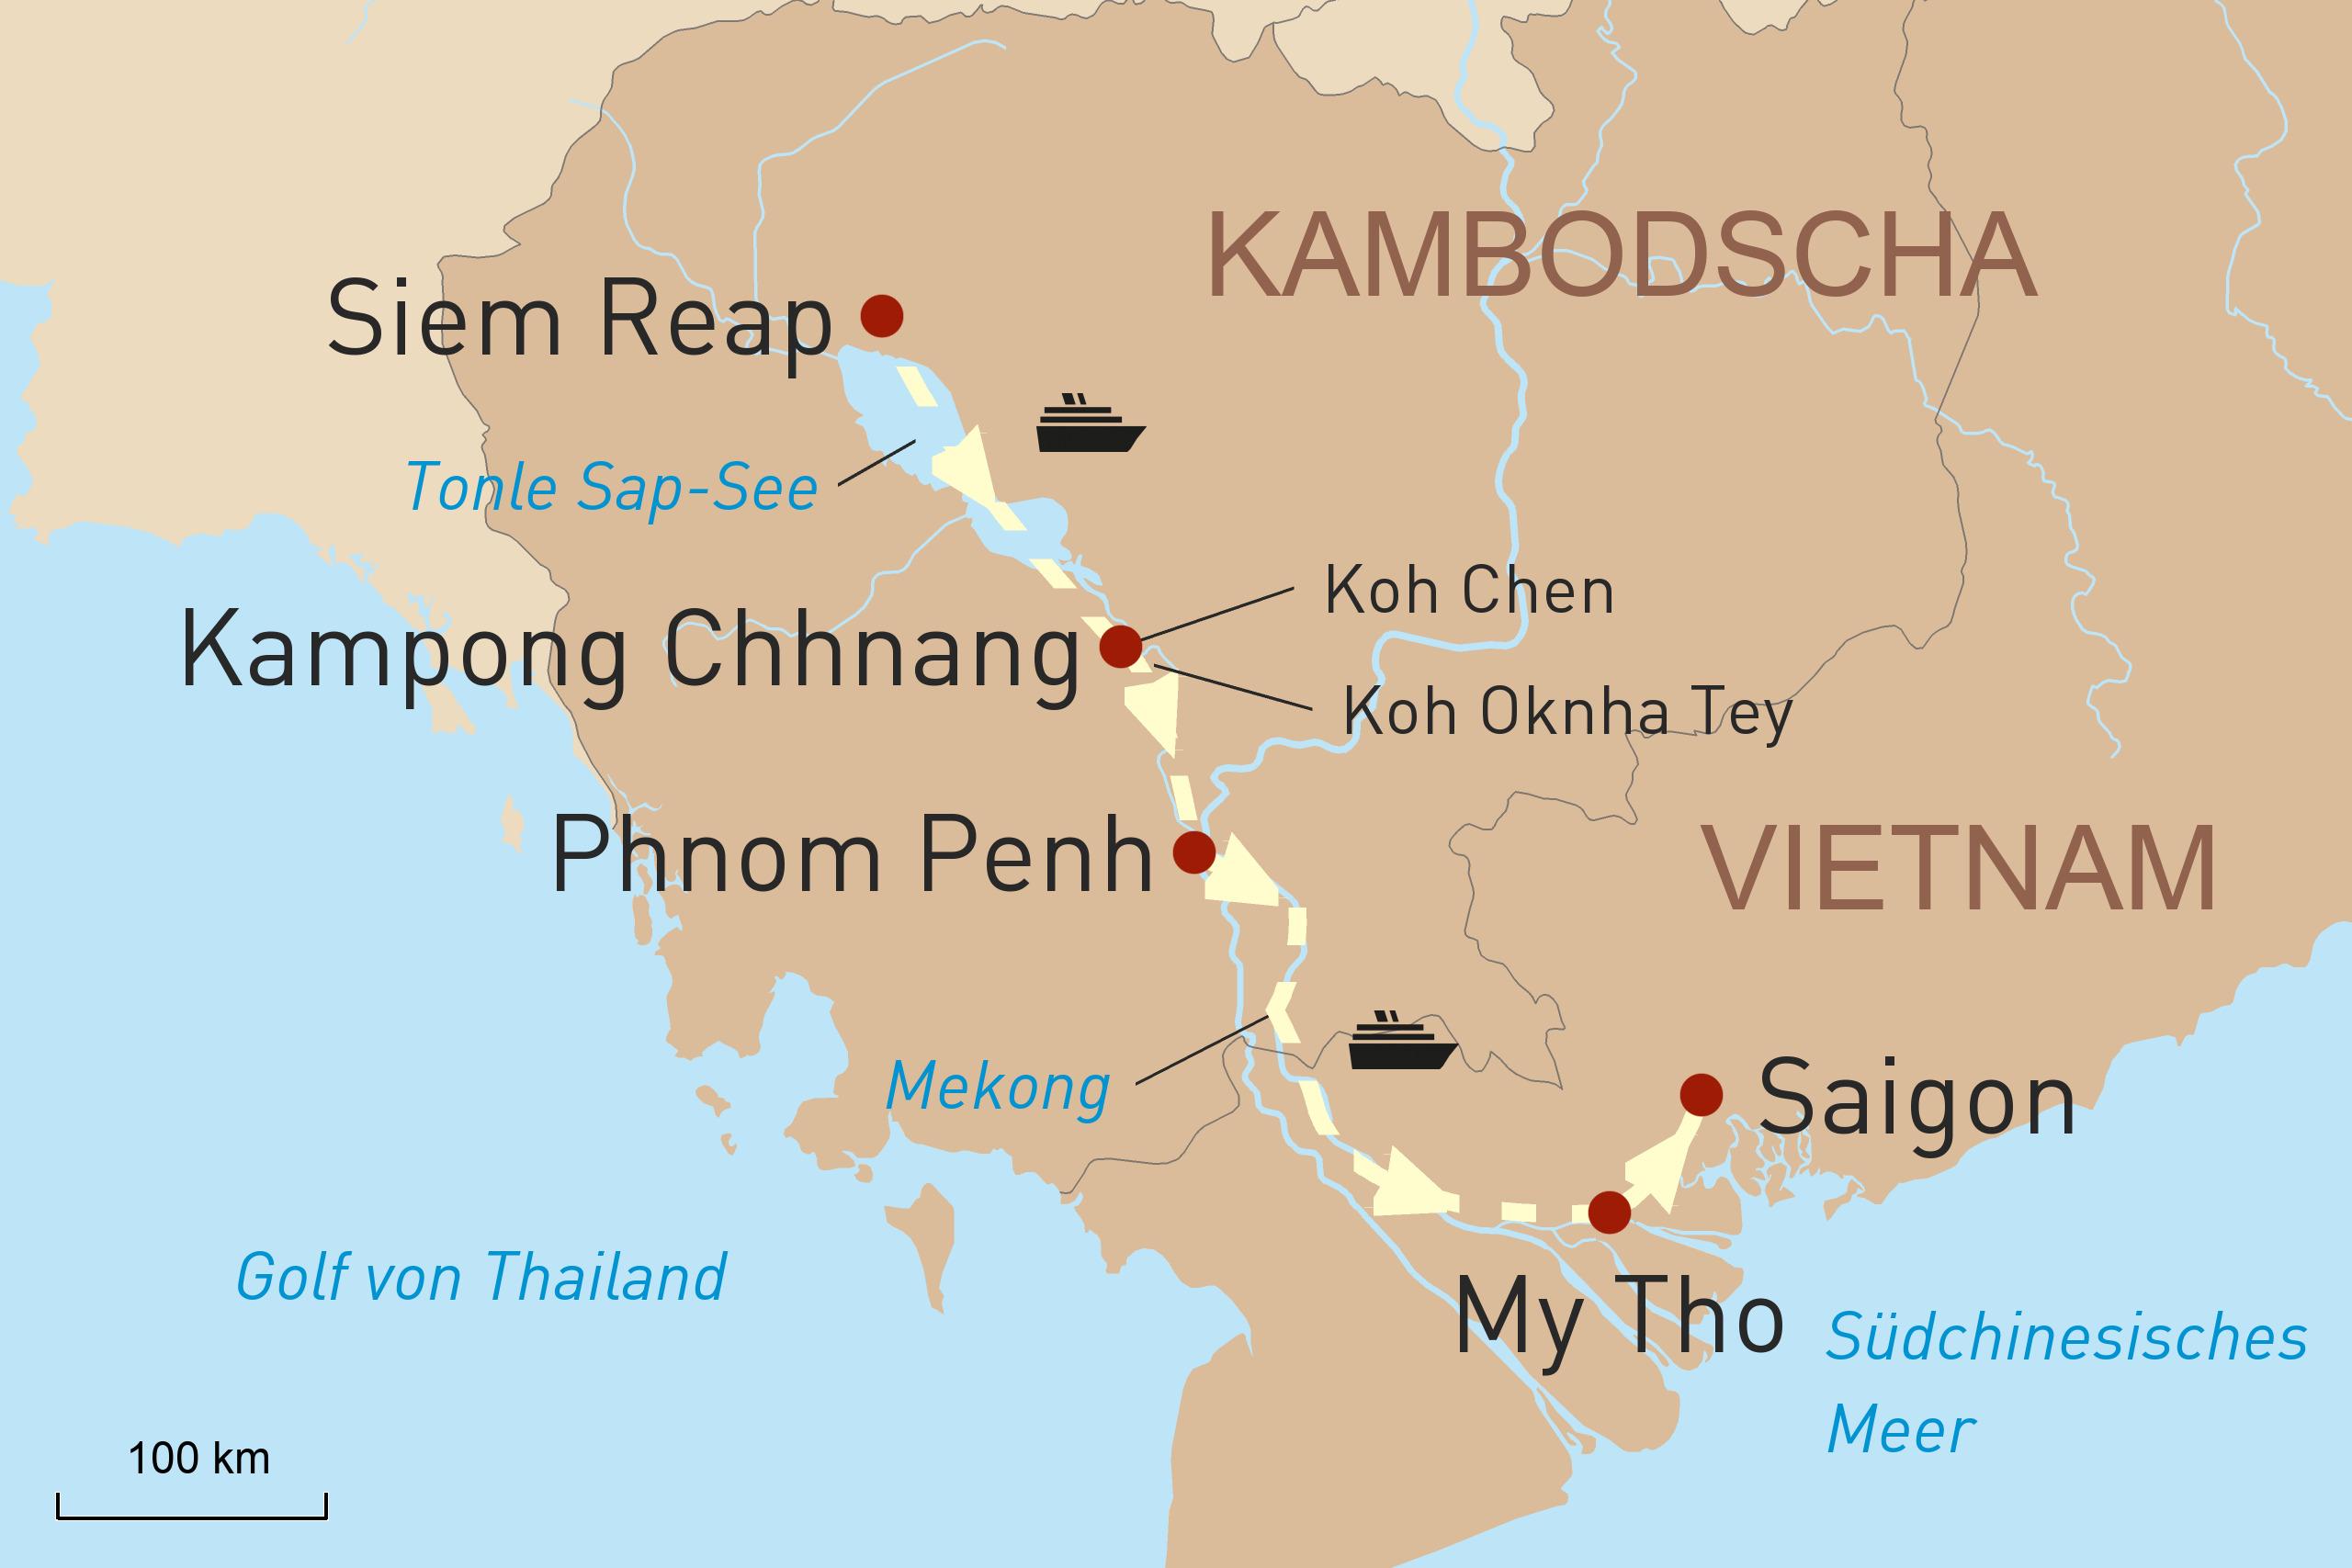 Luxusflusskreuzfahrt auf dem Mekong